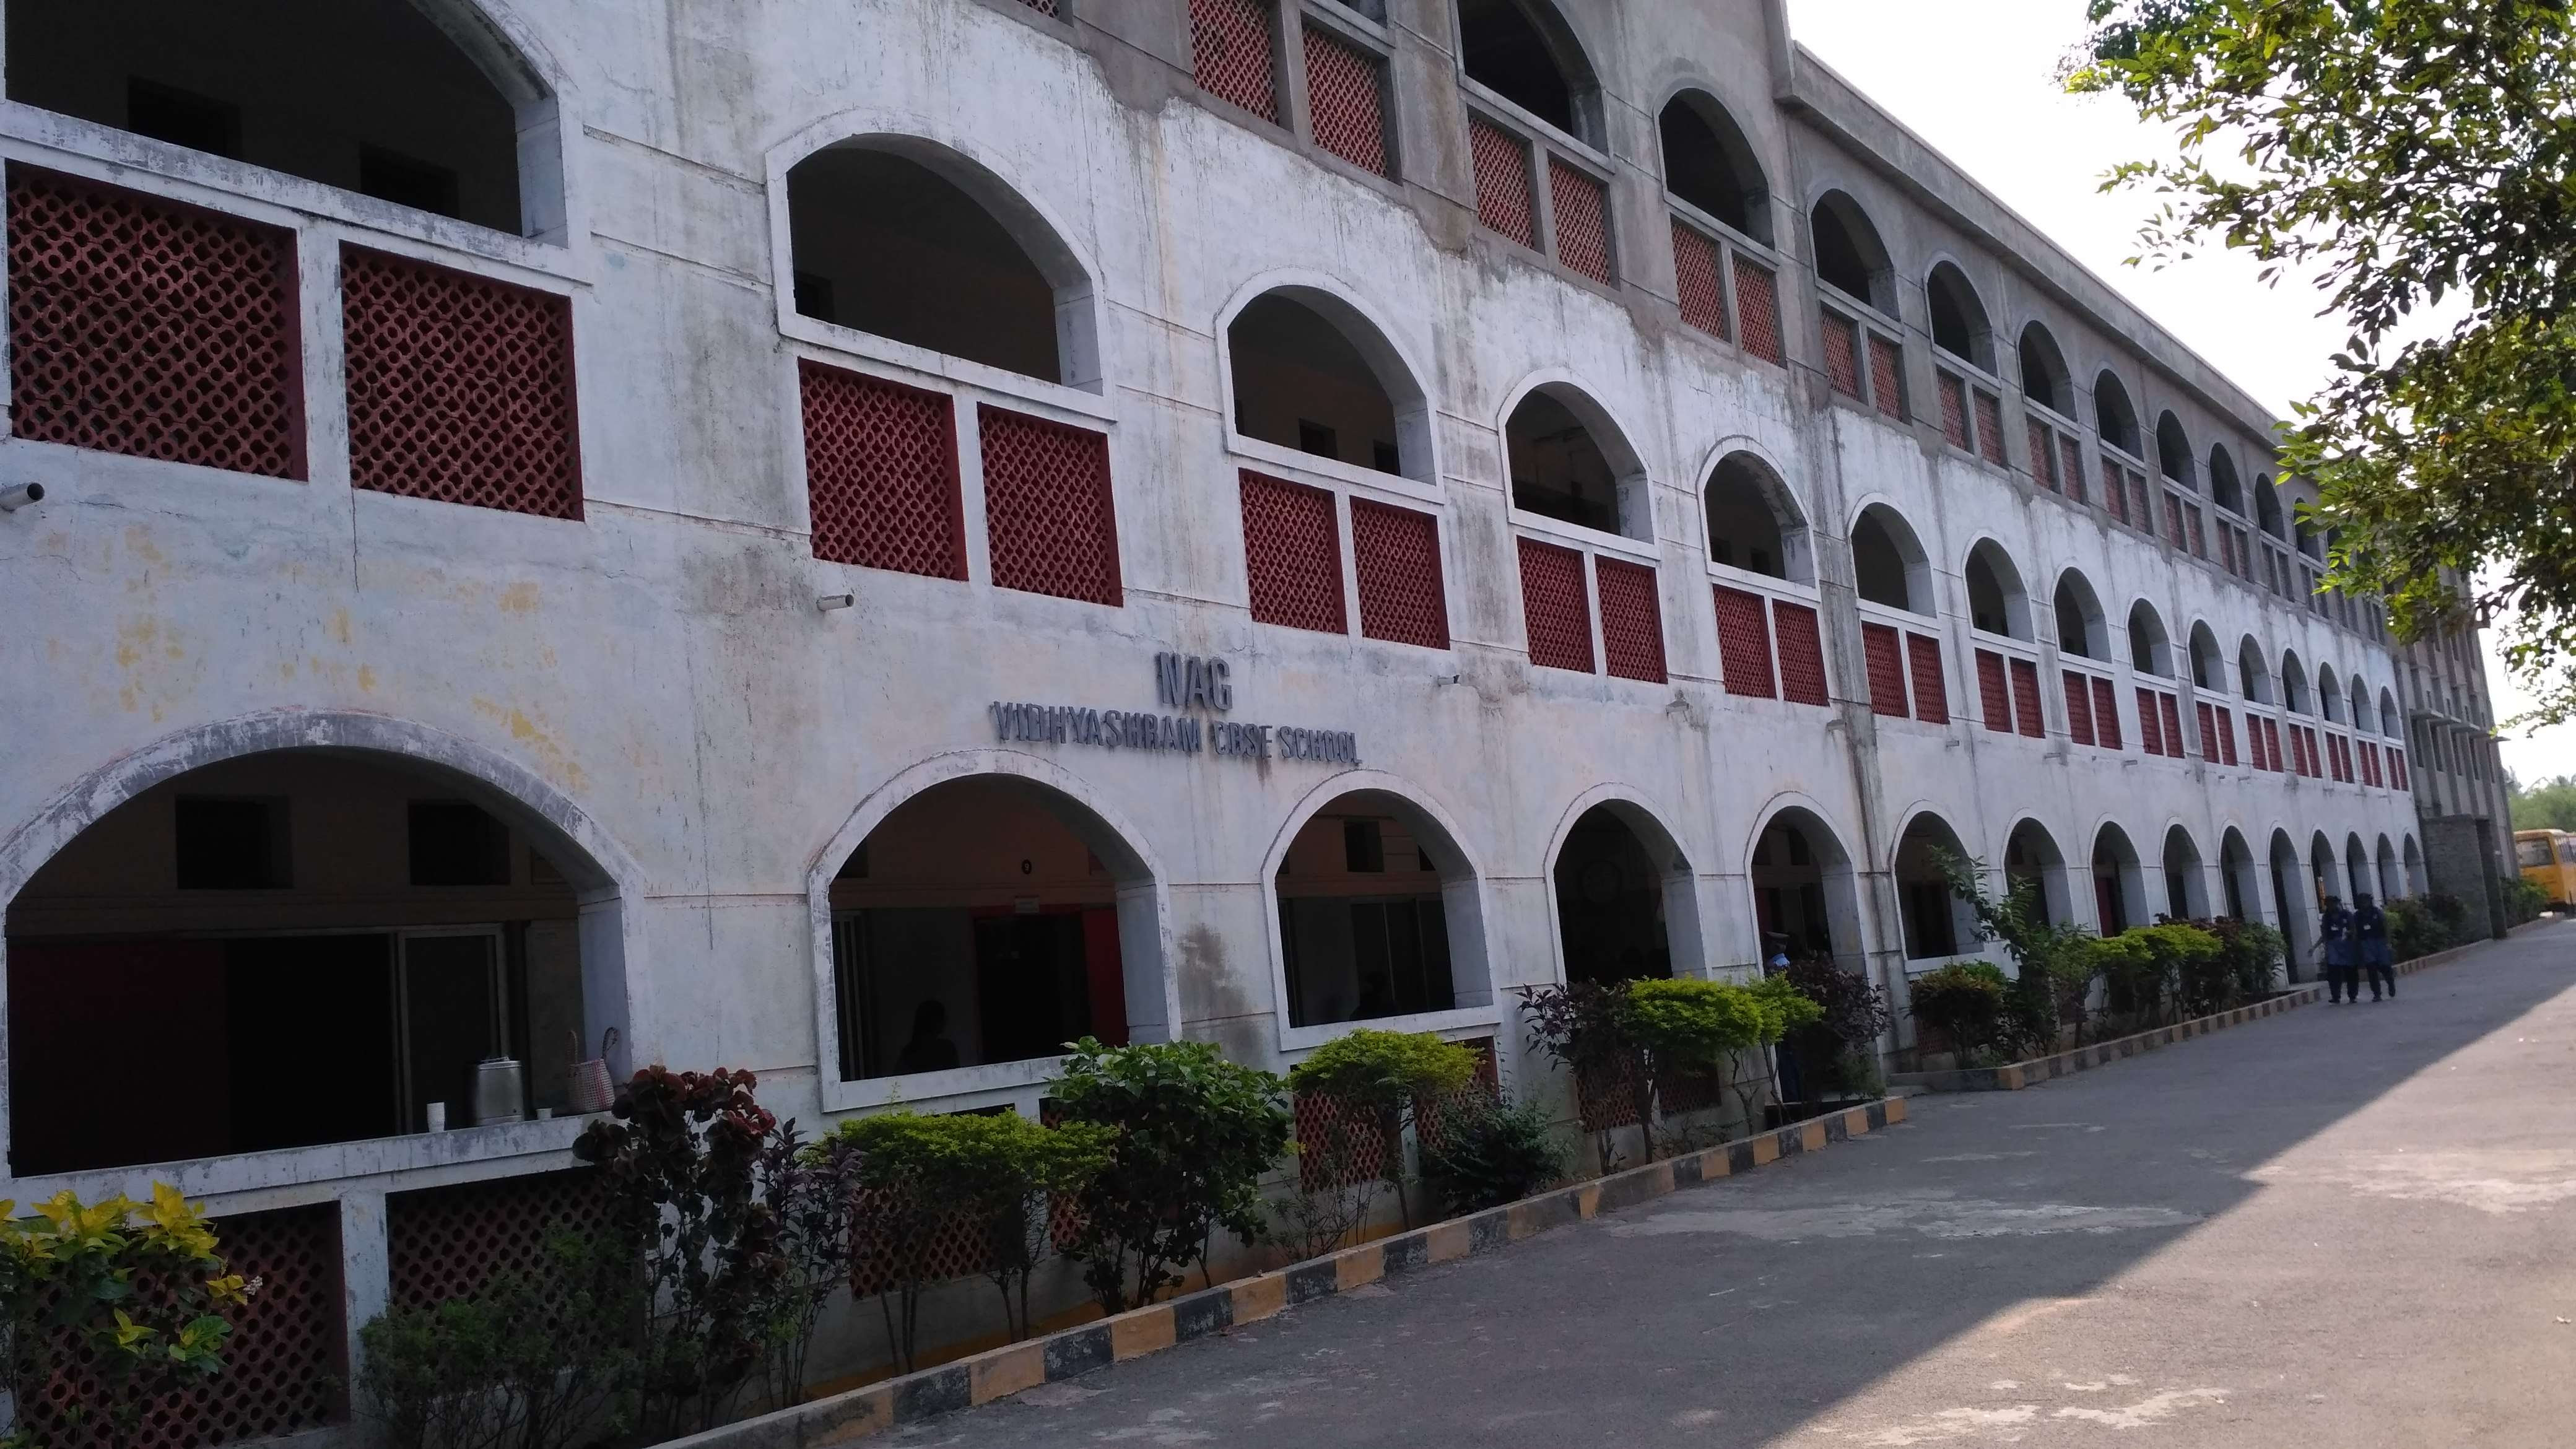 NAG Vidyashram School Sumaithangi Vellore Dist Tamilnadu VELLORE DIST 1930224